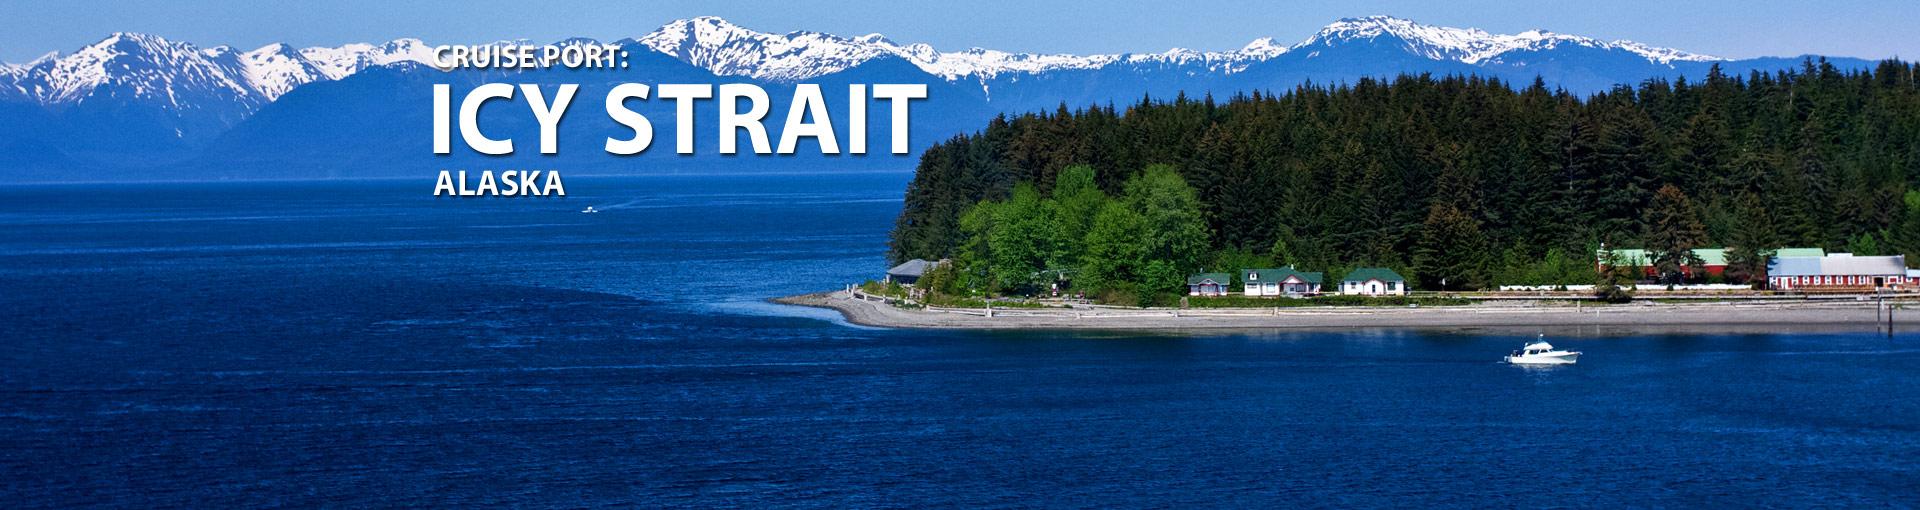 Cruise Port: Icy Strait, Alaska